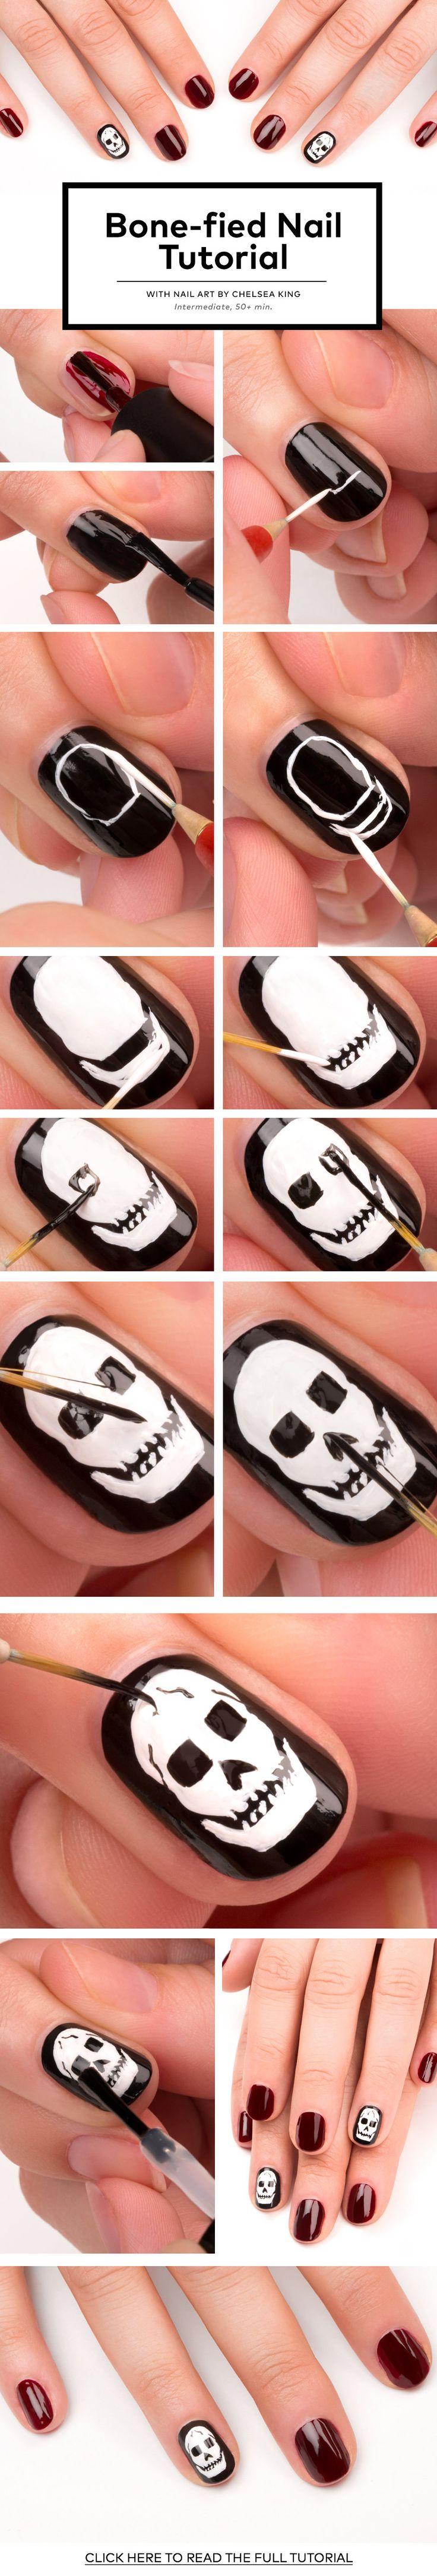 Bone-fied Nail Tutorial | Beautylish